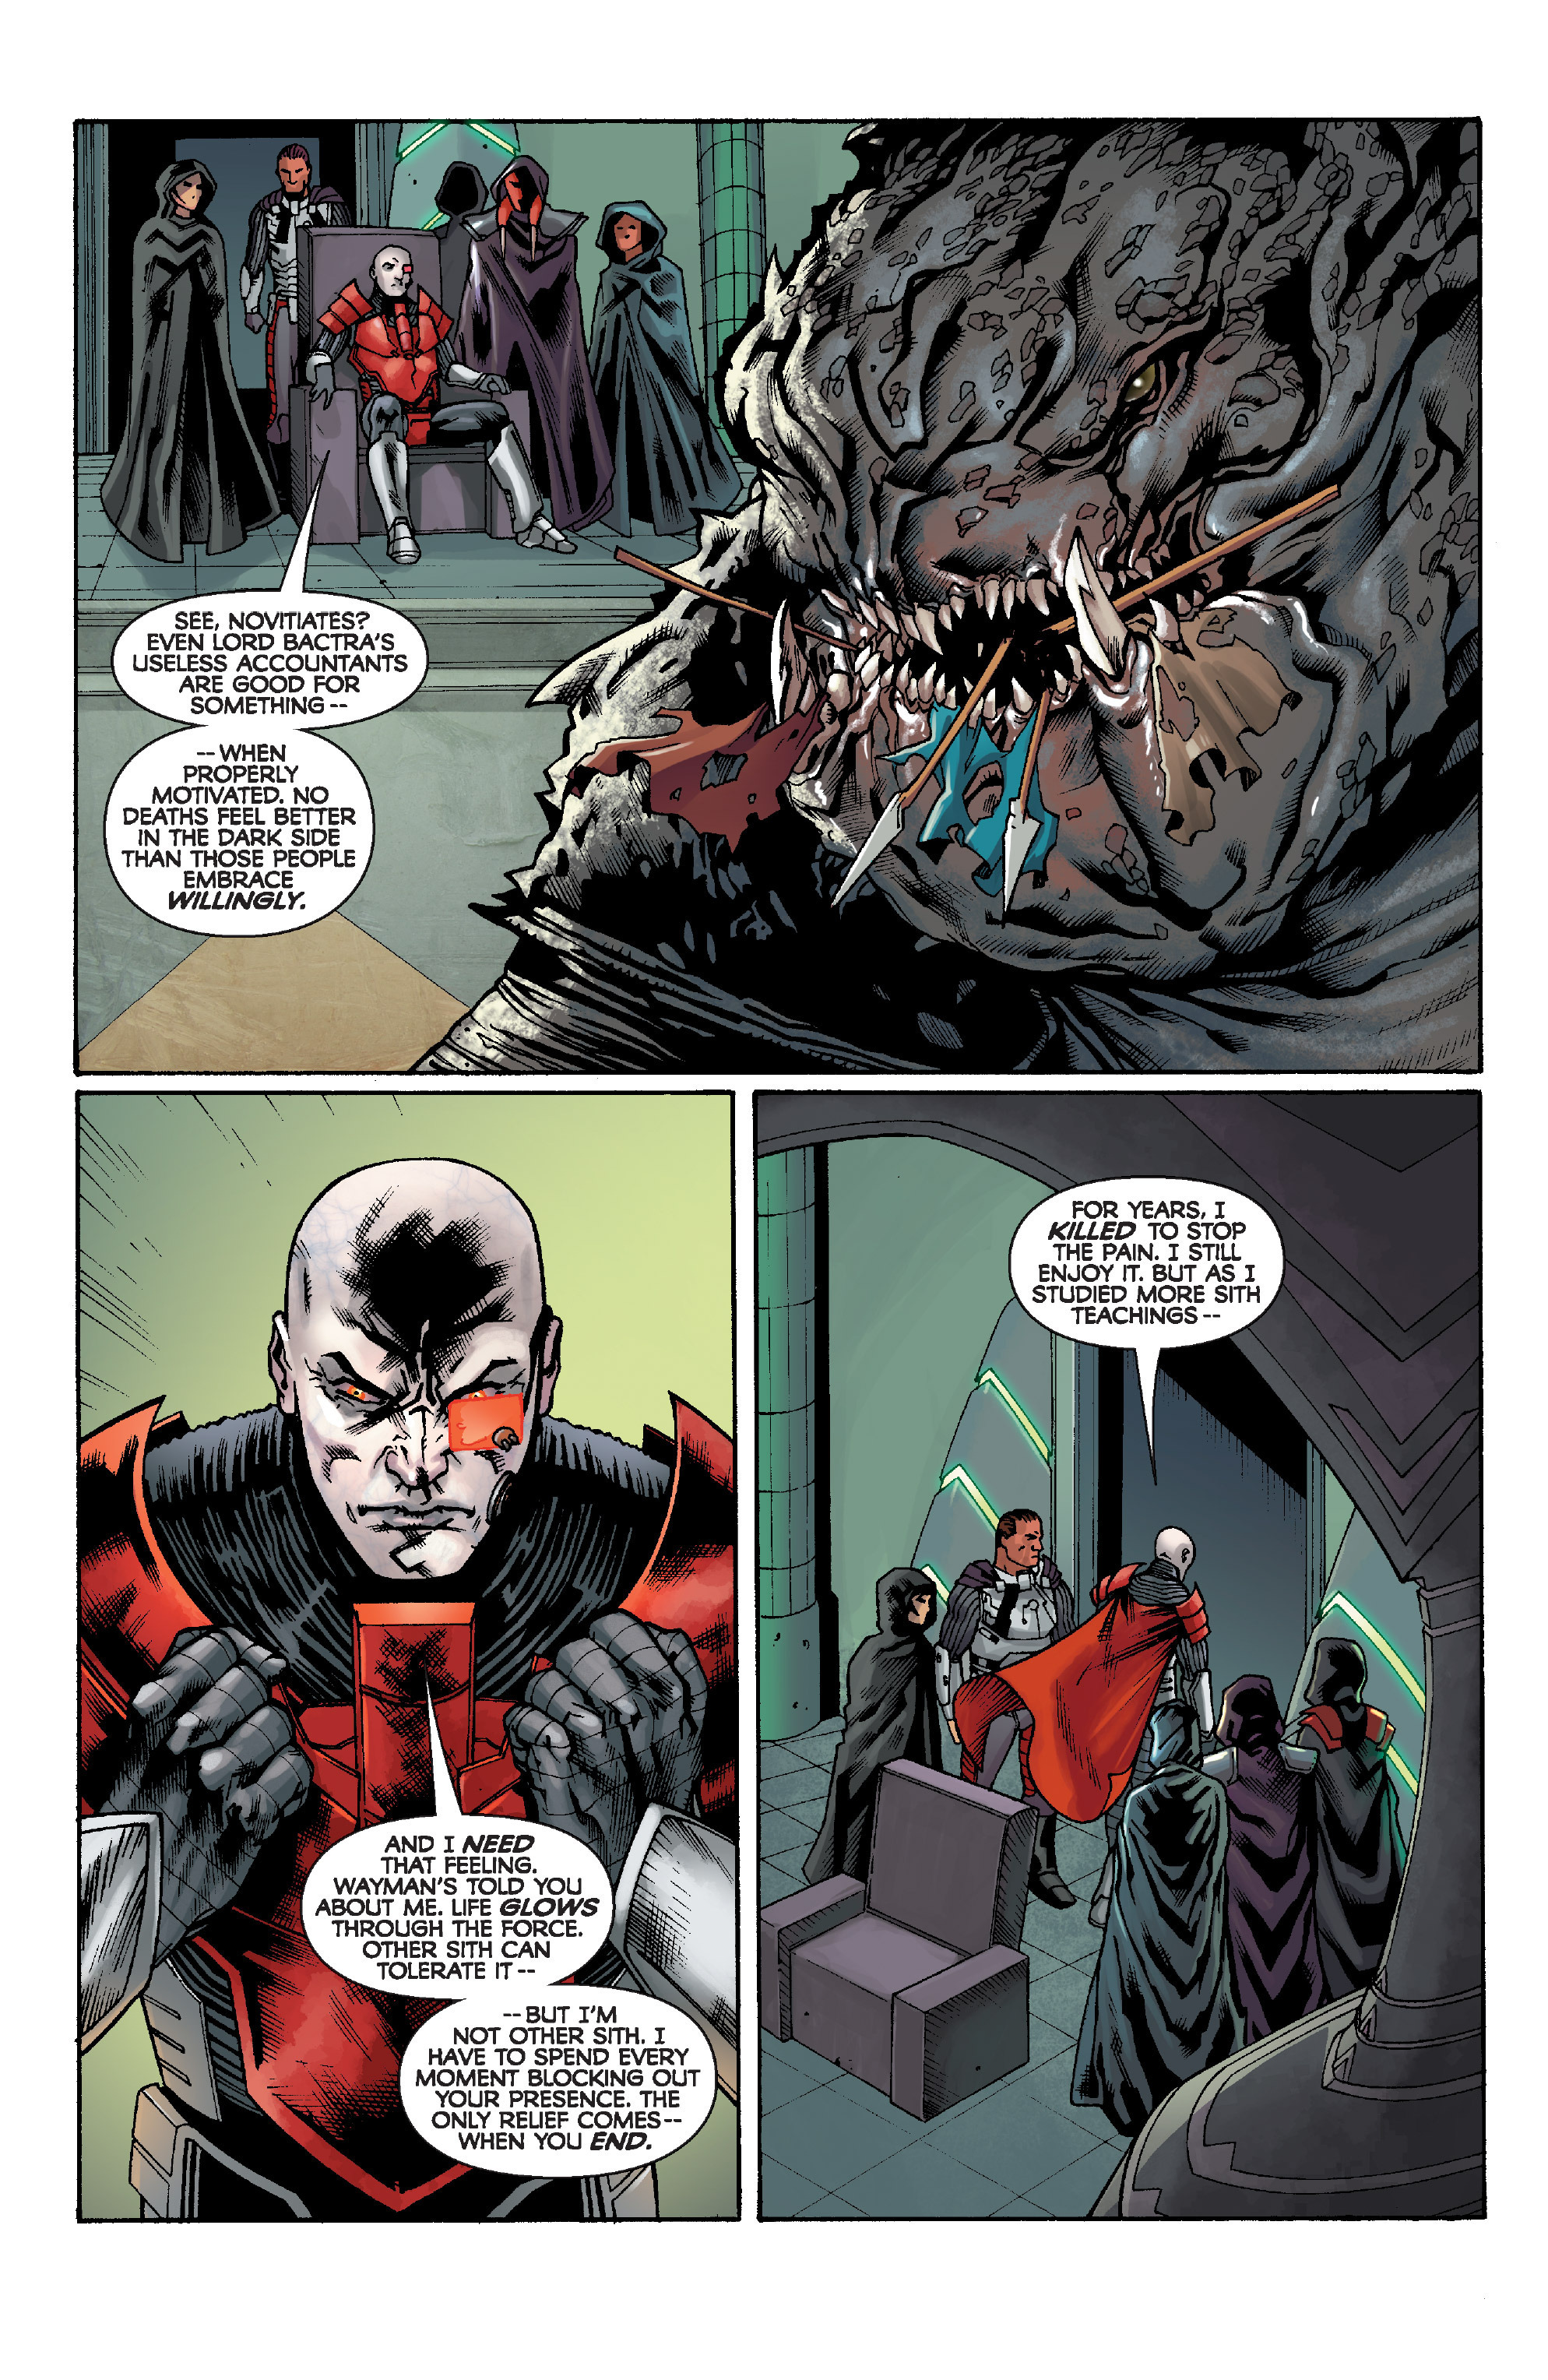 Read online Star Wars: Knight Errant - Escape comic -  Issue #1 - 18